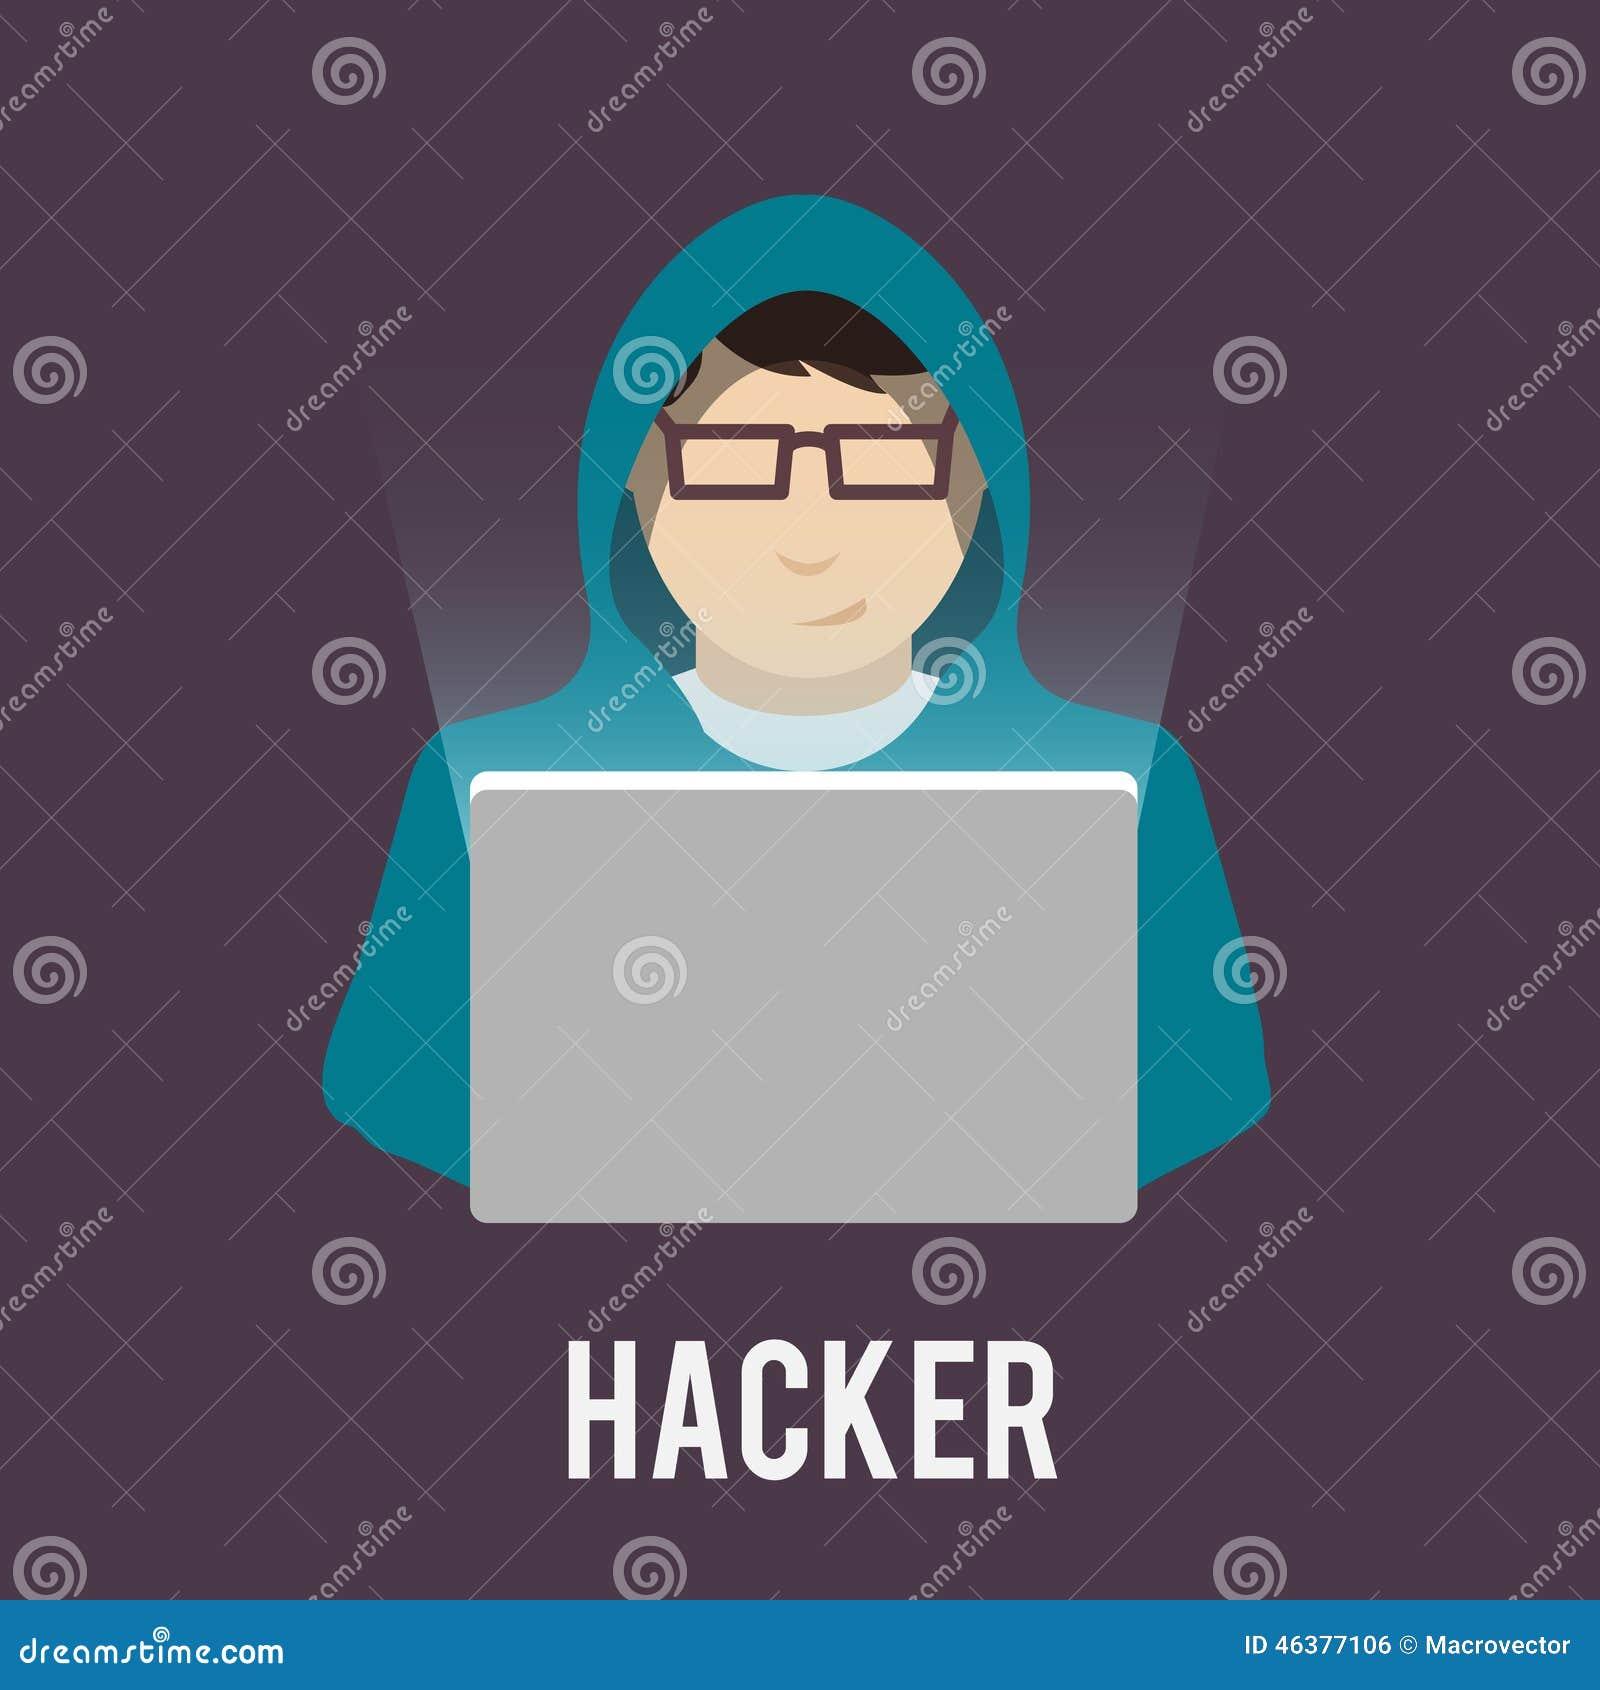 Hacker Icons Flat Stock Vector - Image: 46377106